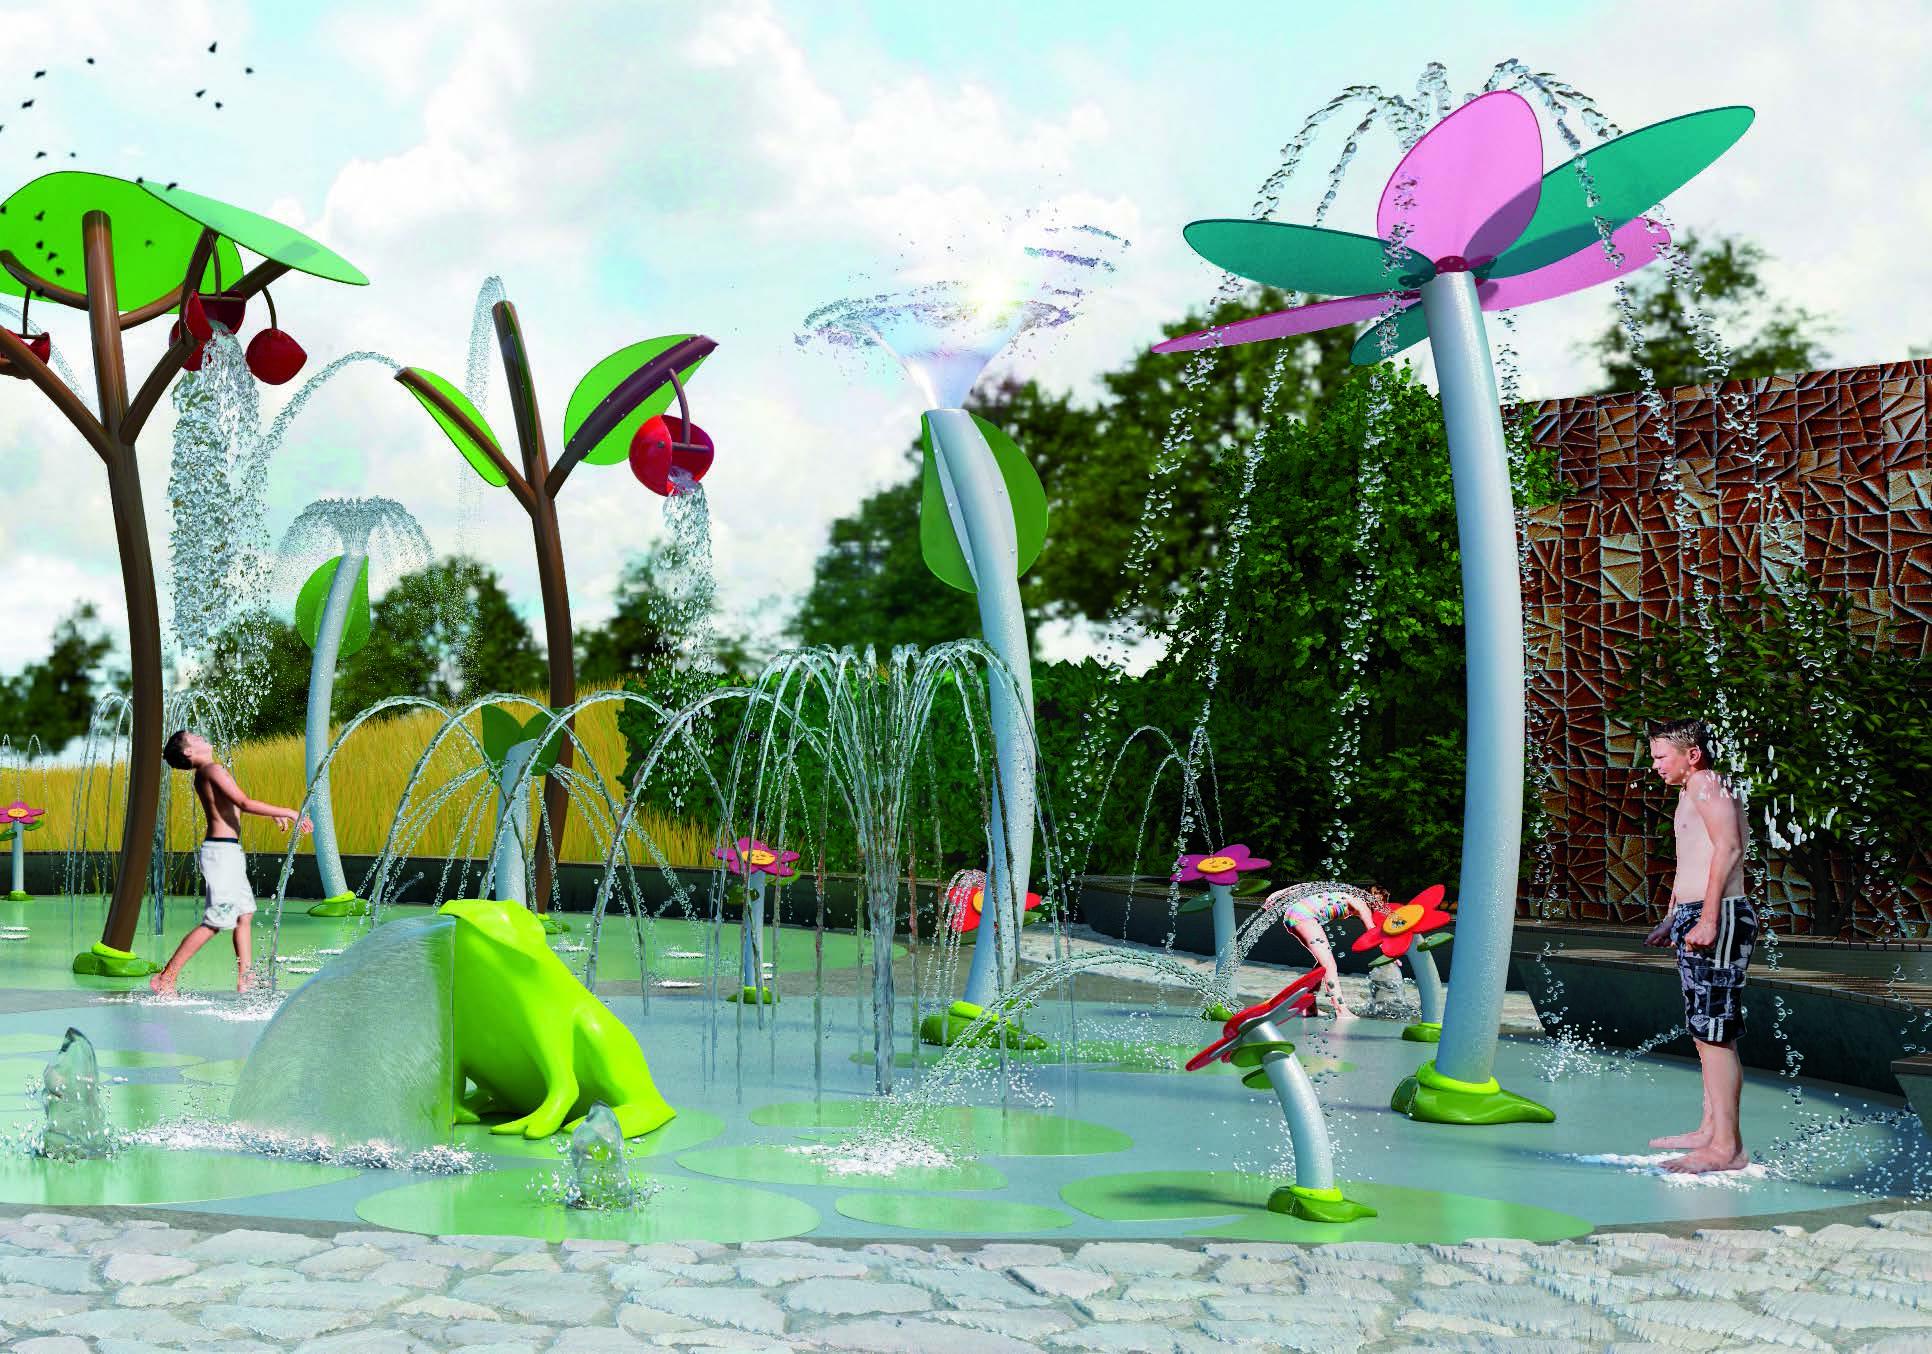 Good Quality water park design build,aqua park equipment,water park equipment for kids Featured Image